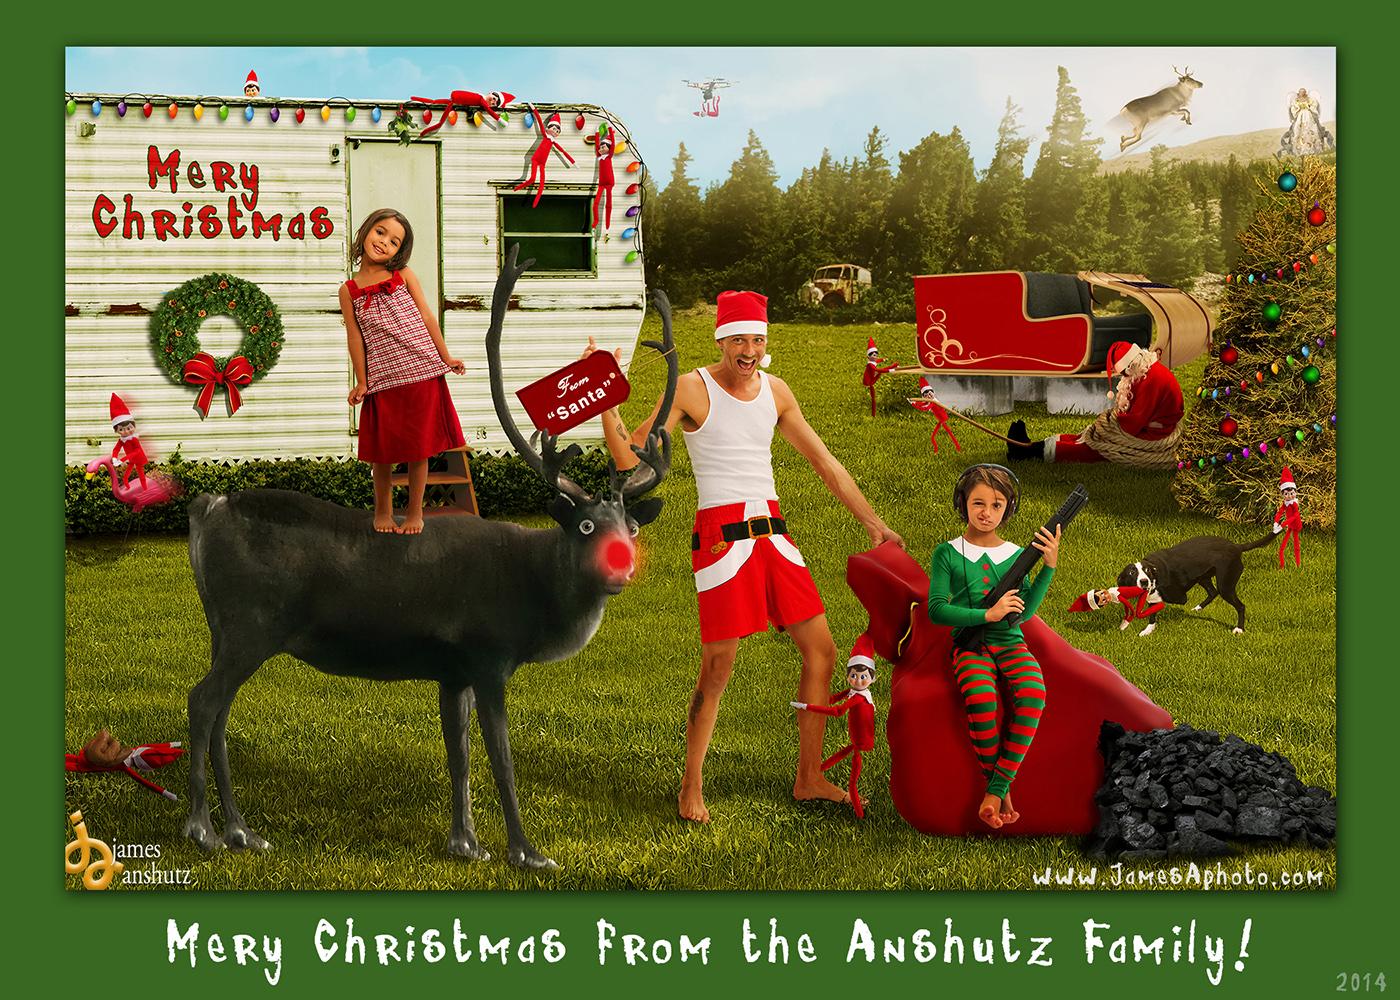 2014 James Anshutz Family Christmas Card.jpg